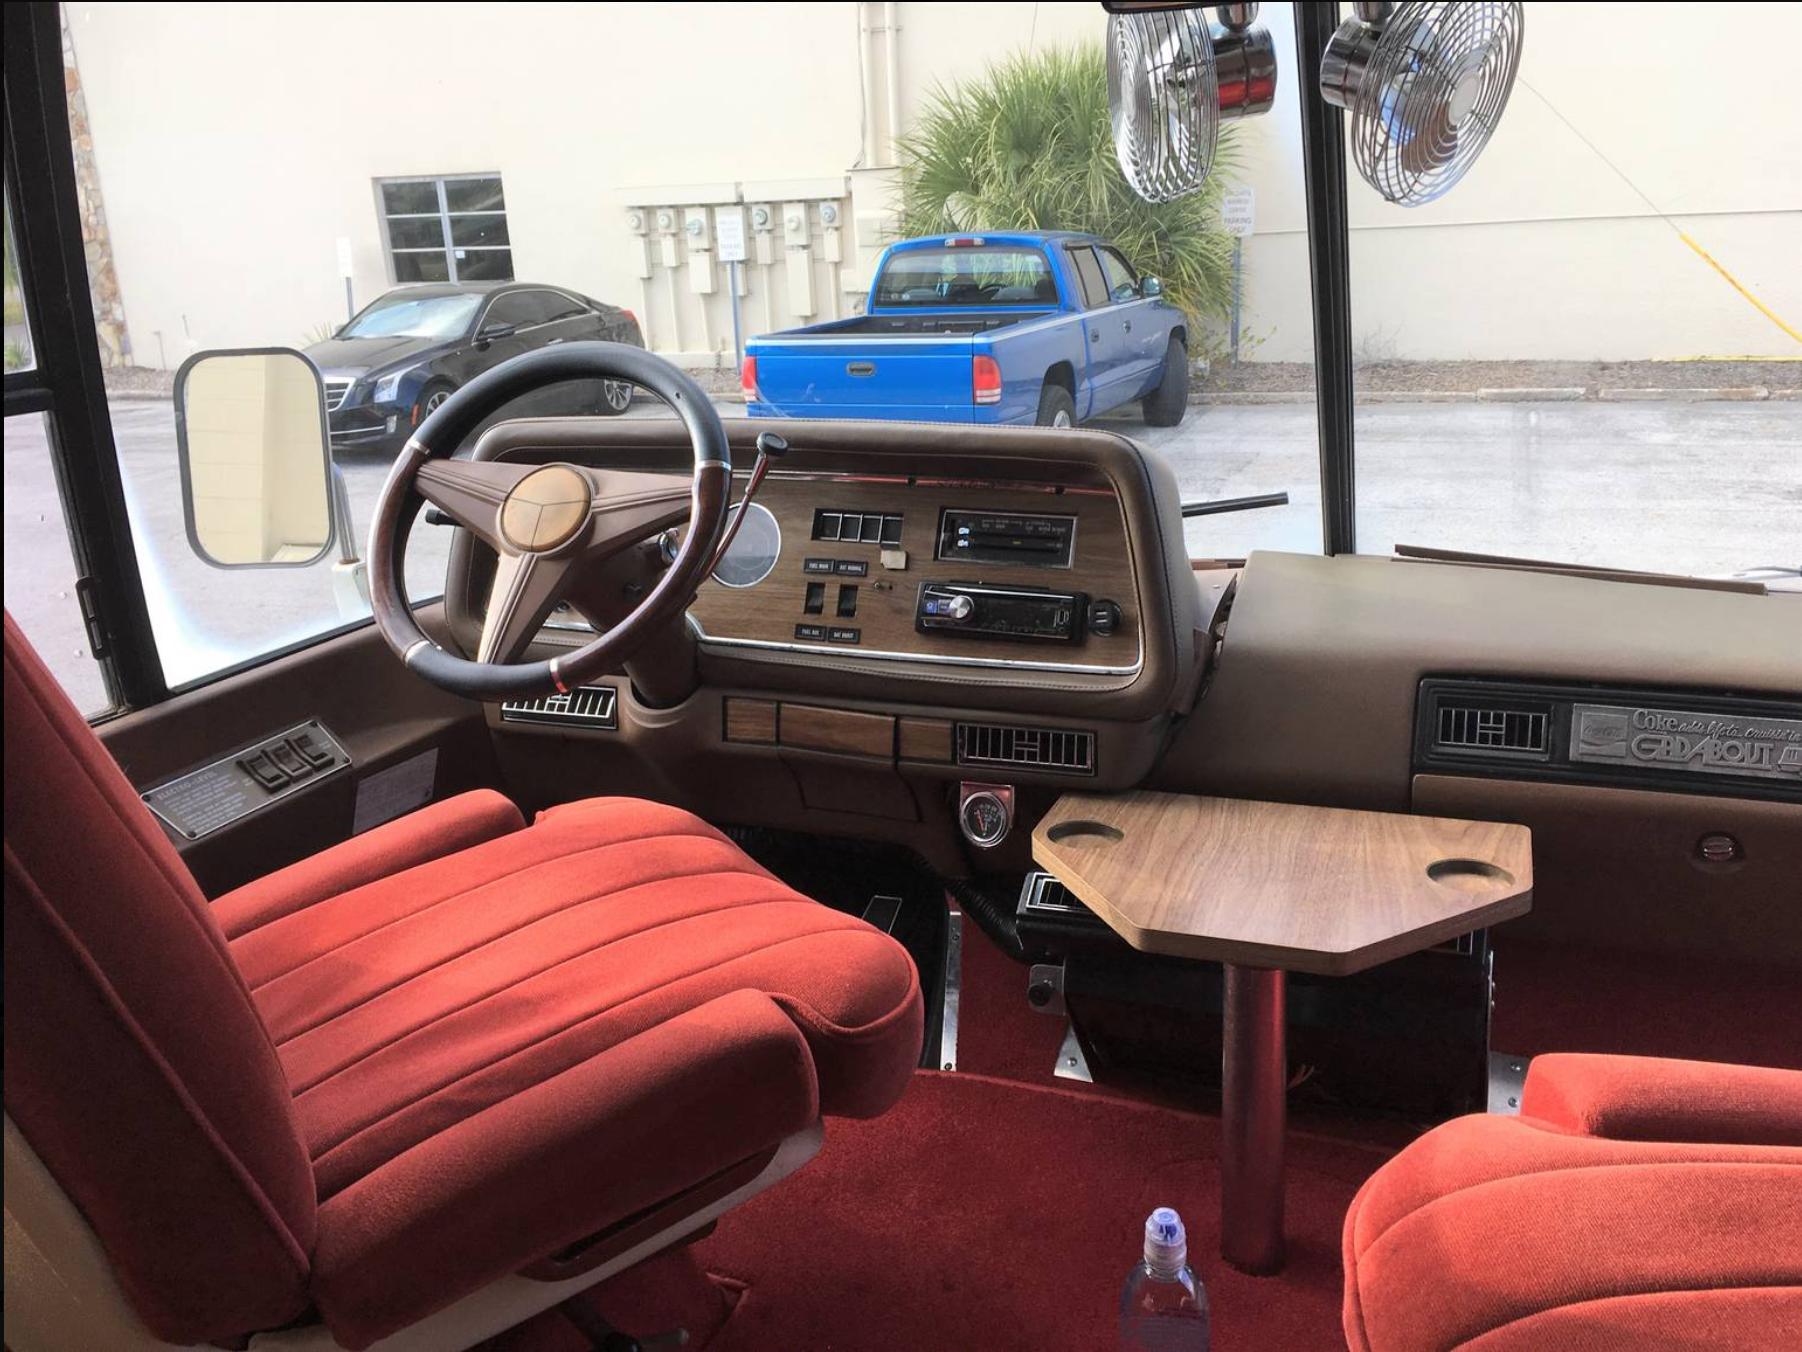 1978 GMC RV interior